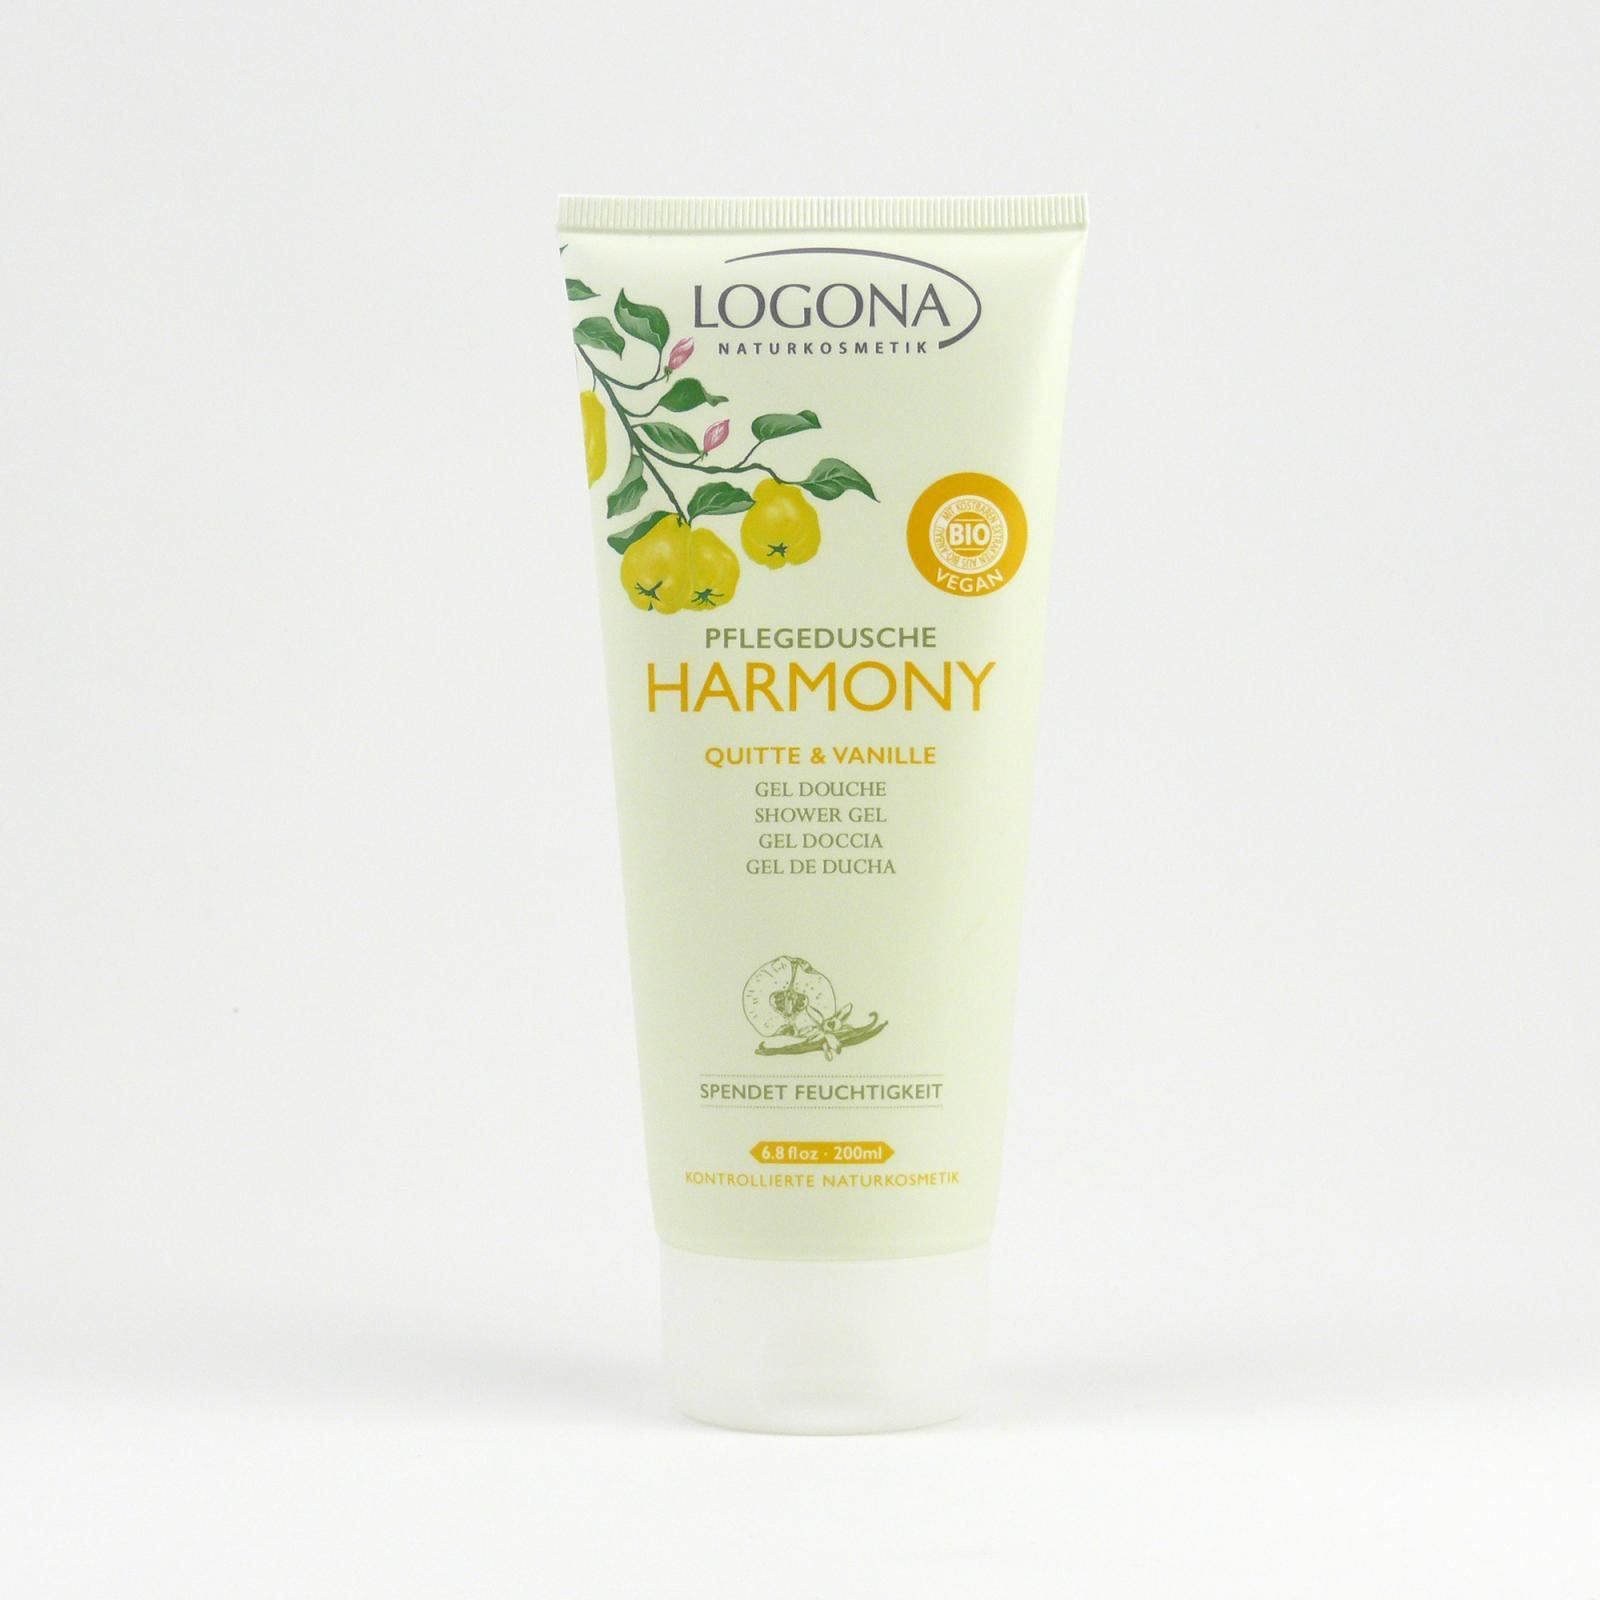 Logona Sprchový gel kdoule a vanilka, Harmony 200 ml